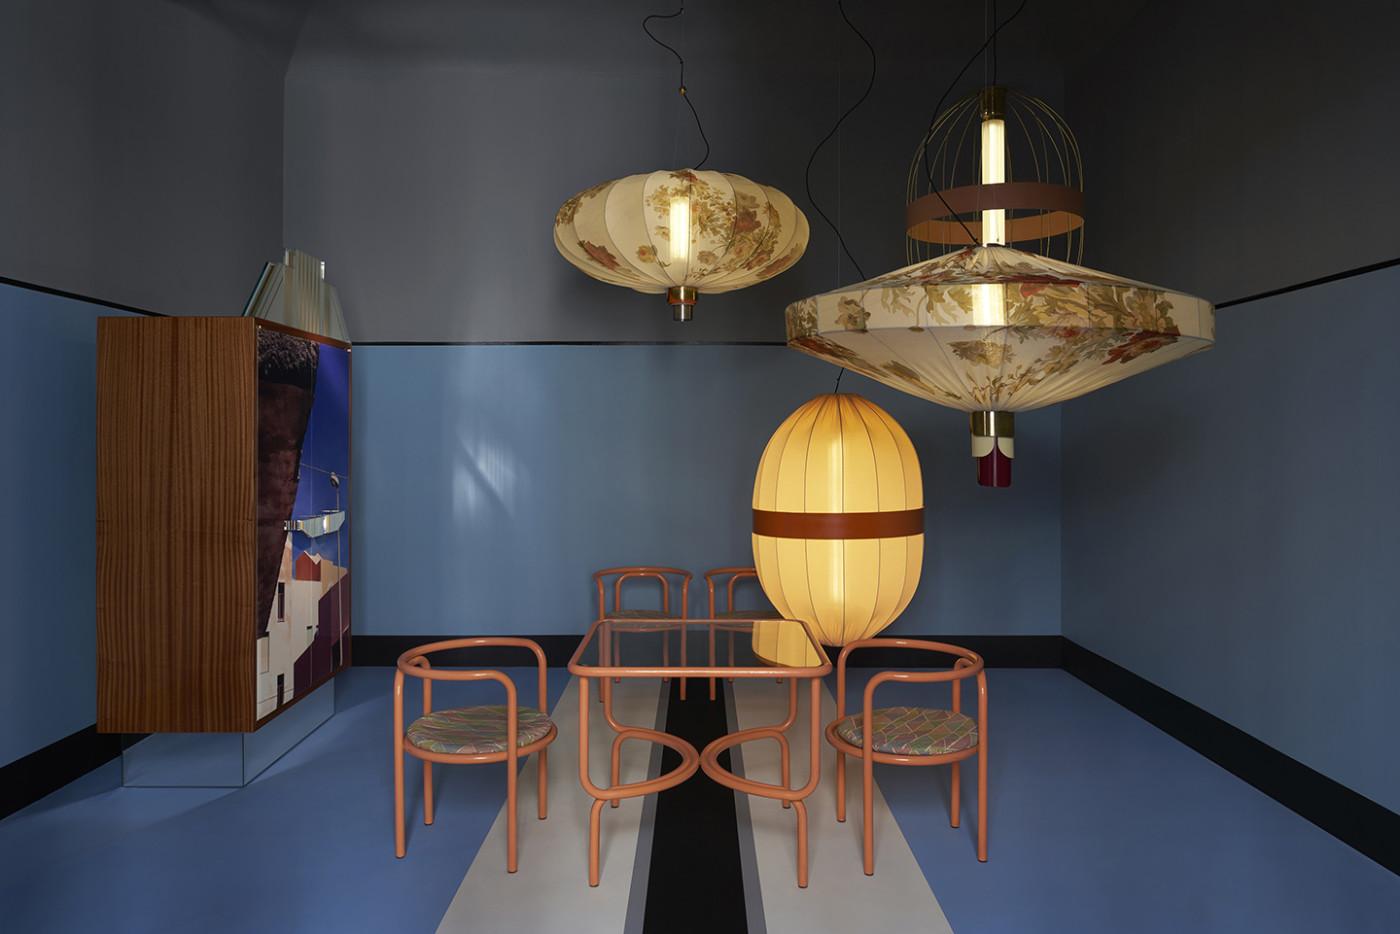 Dimore Studio 's Salone del Mobile 2017 showroom apartment. Photography: Paola Pansini